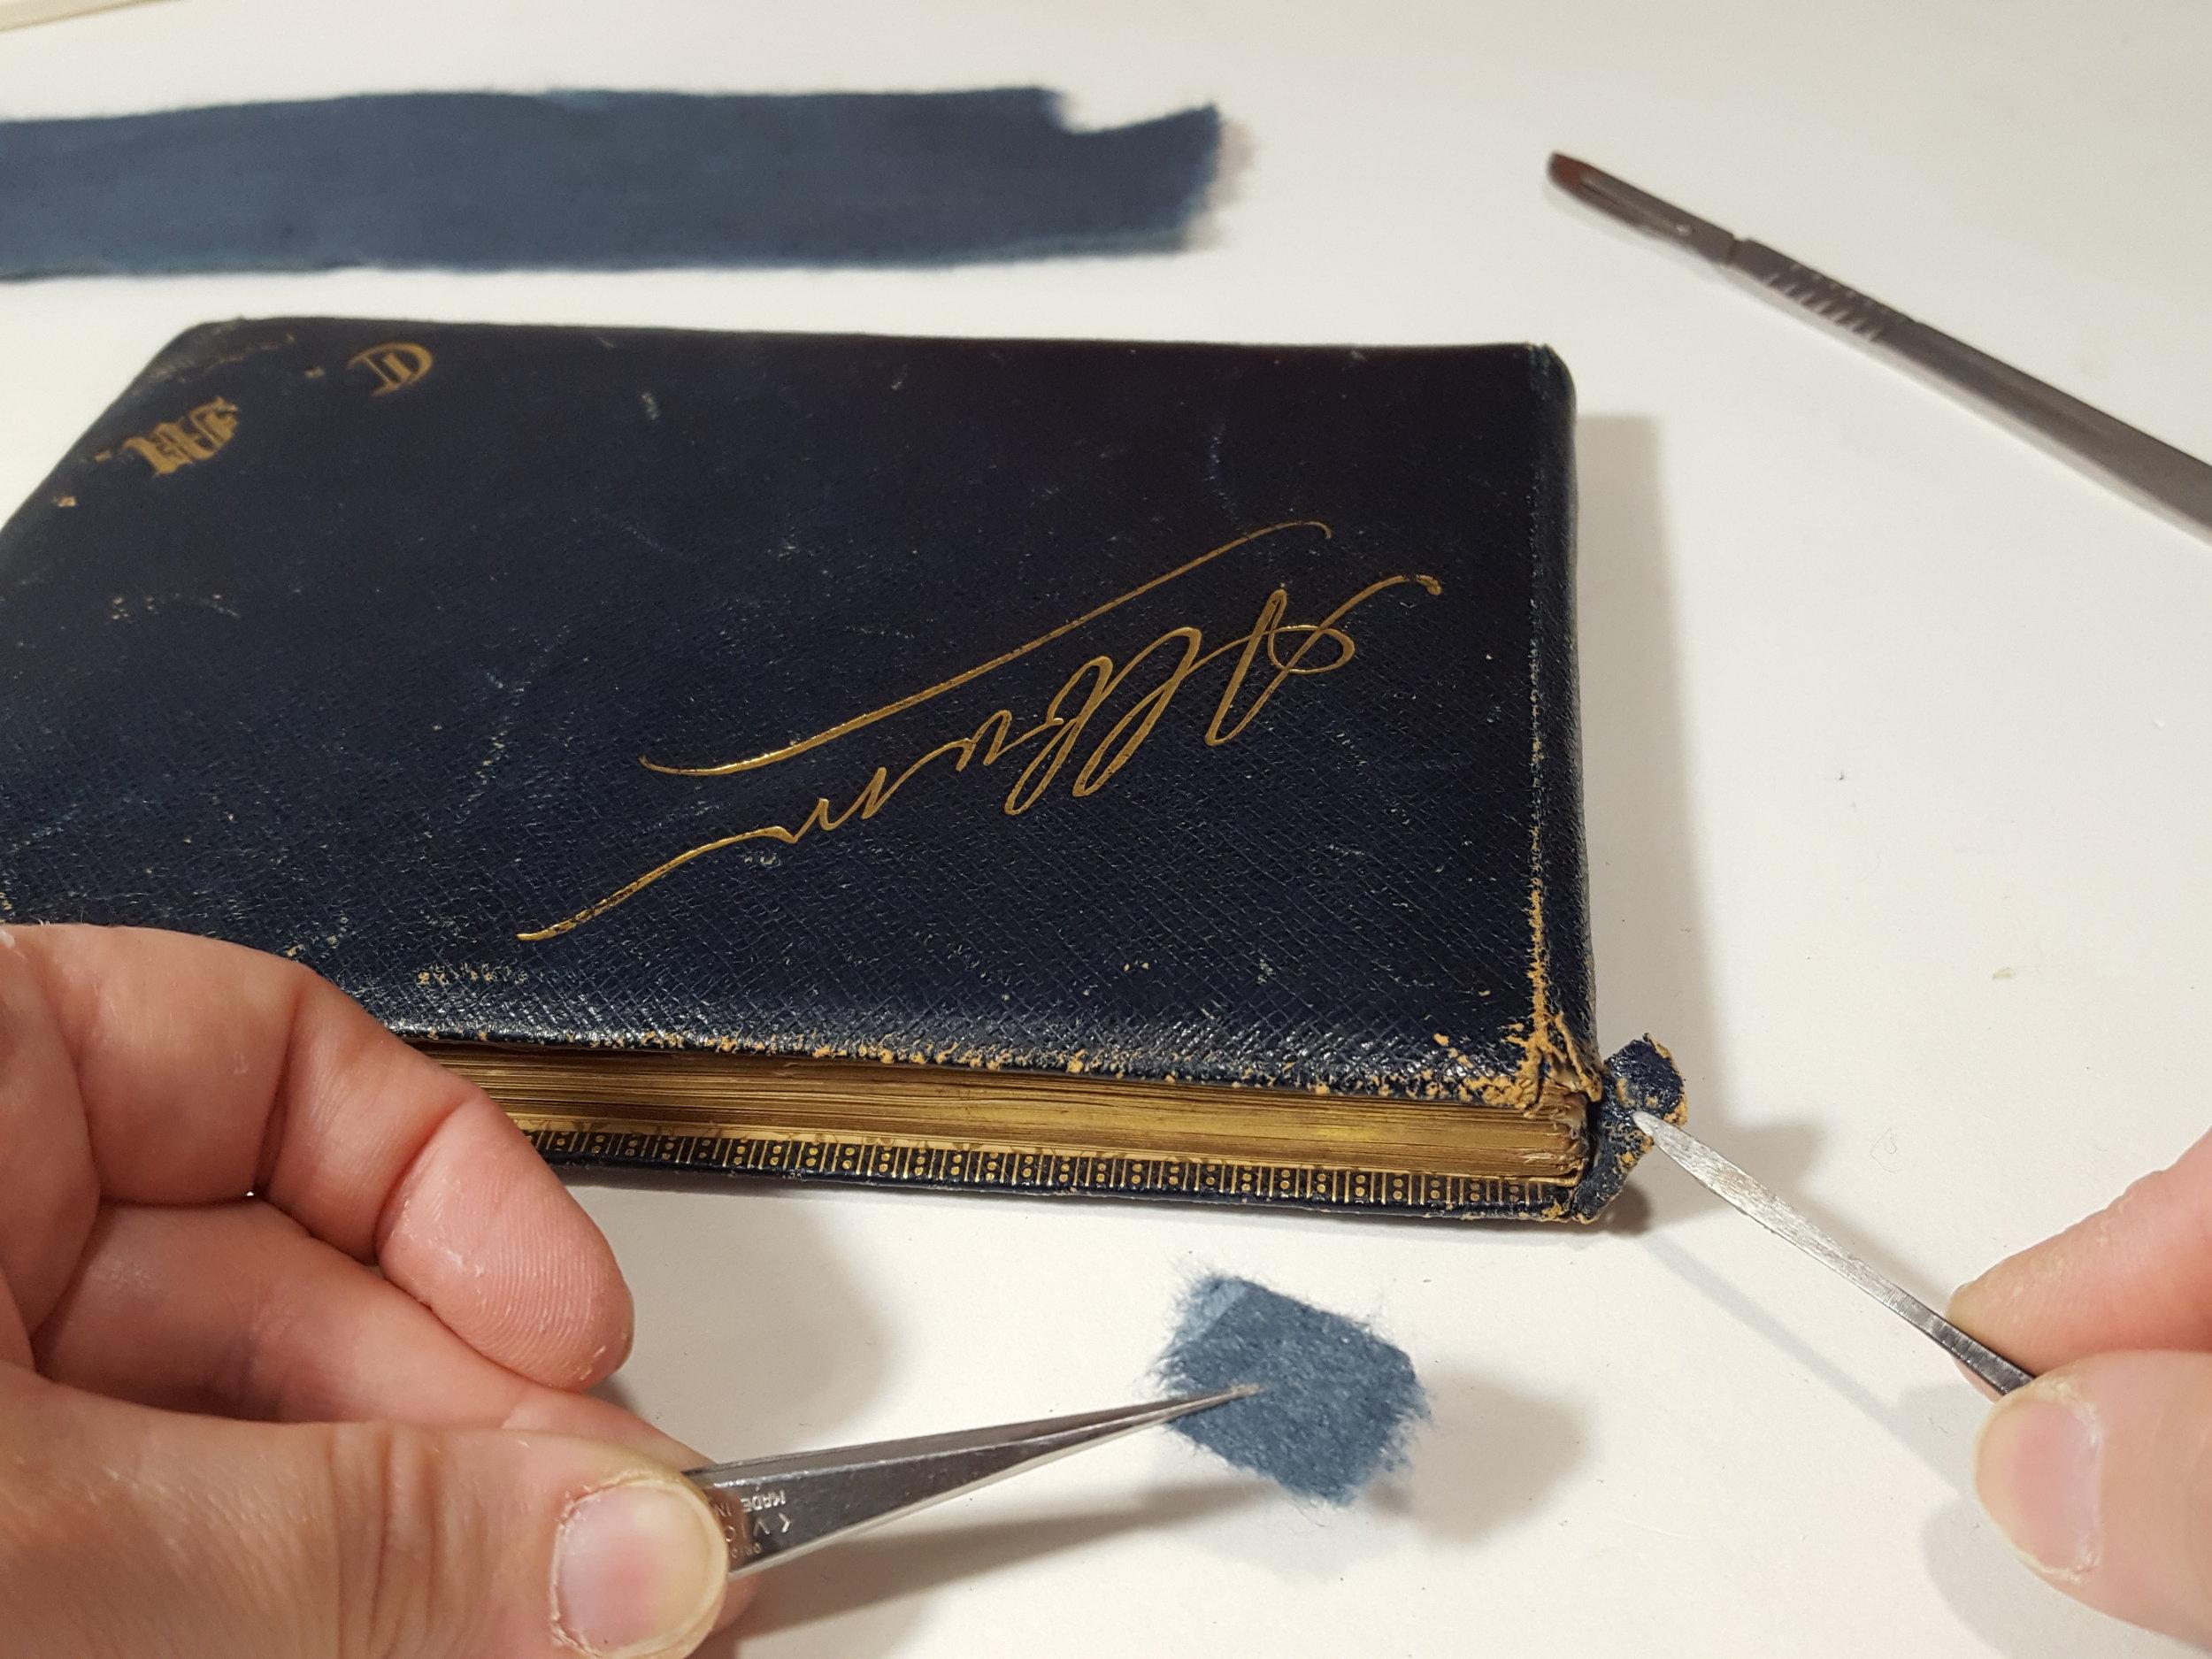 Repair to headcap of the album's leather binding.